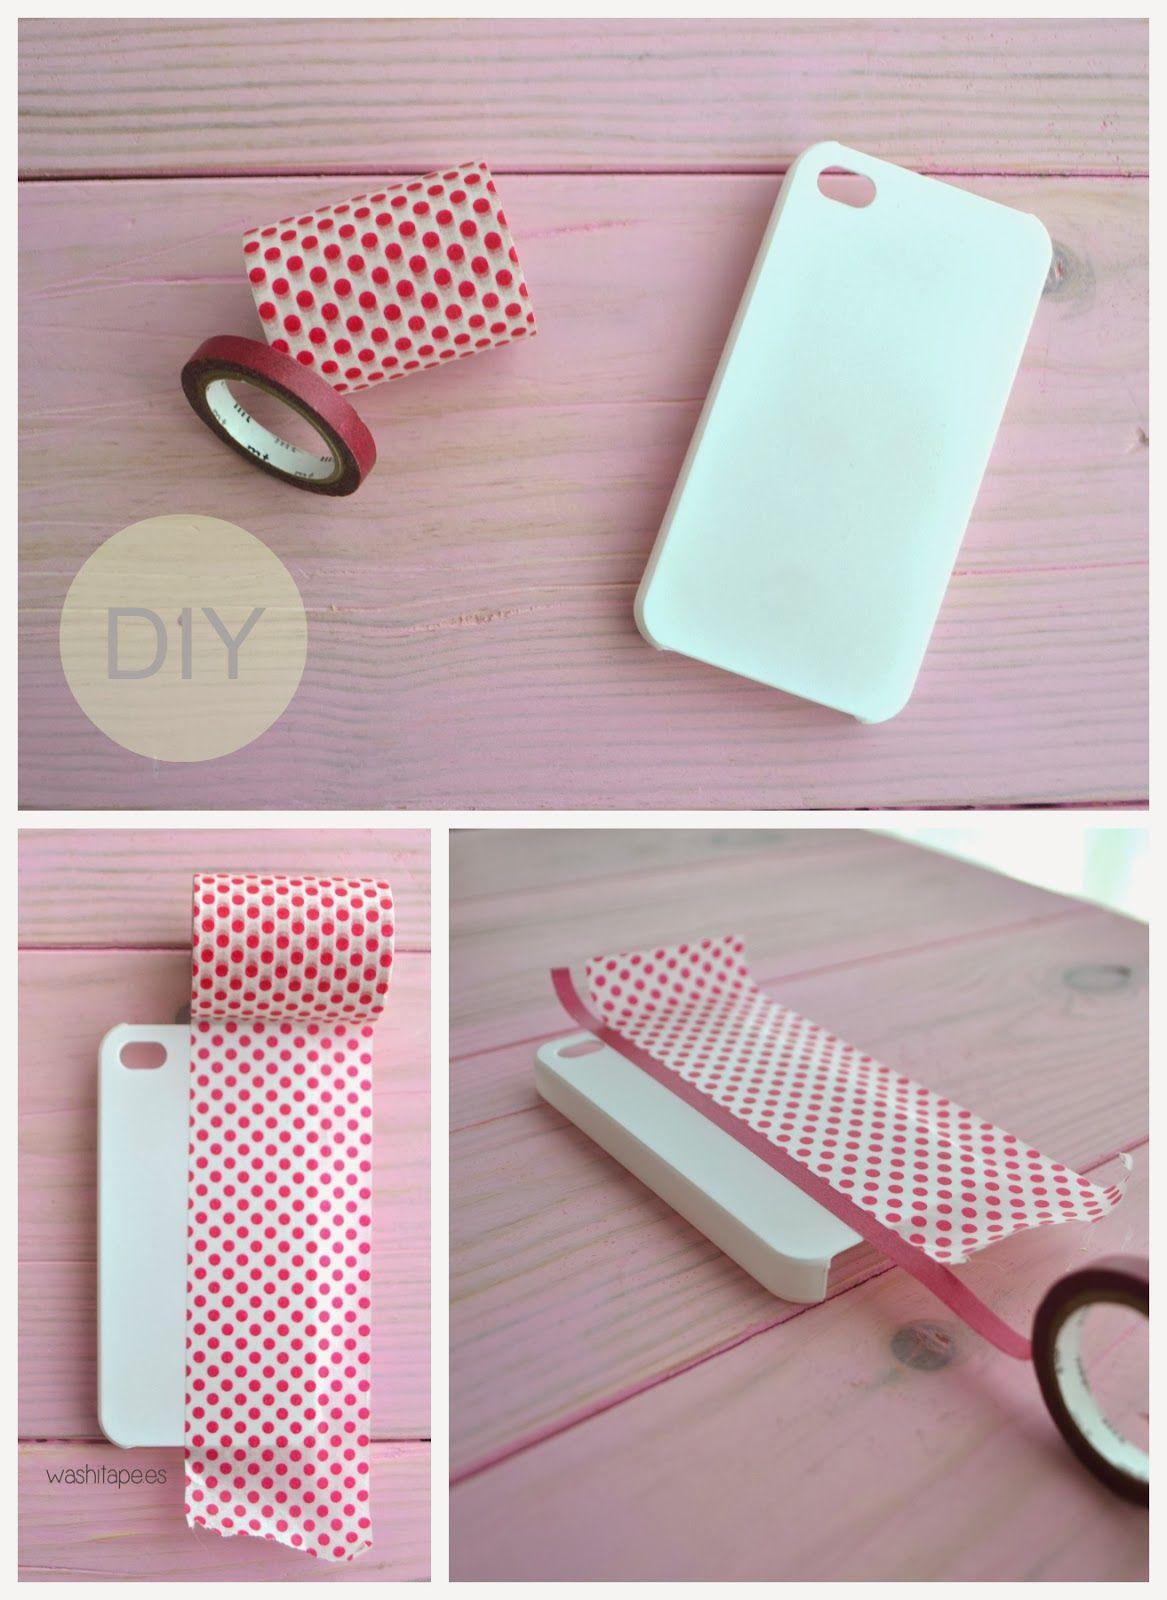 9a57bafeab0 washi tape: DIY: Funda de móvil con washi tape | diy | Fundas ...